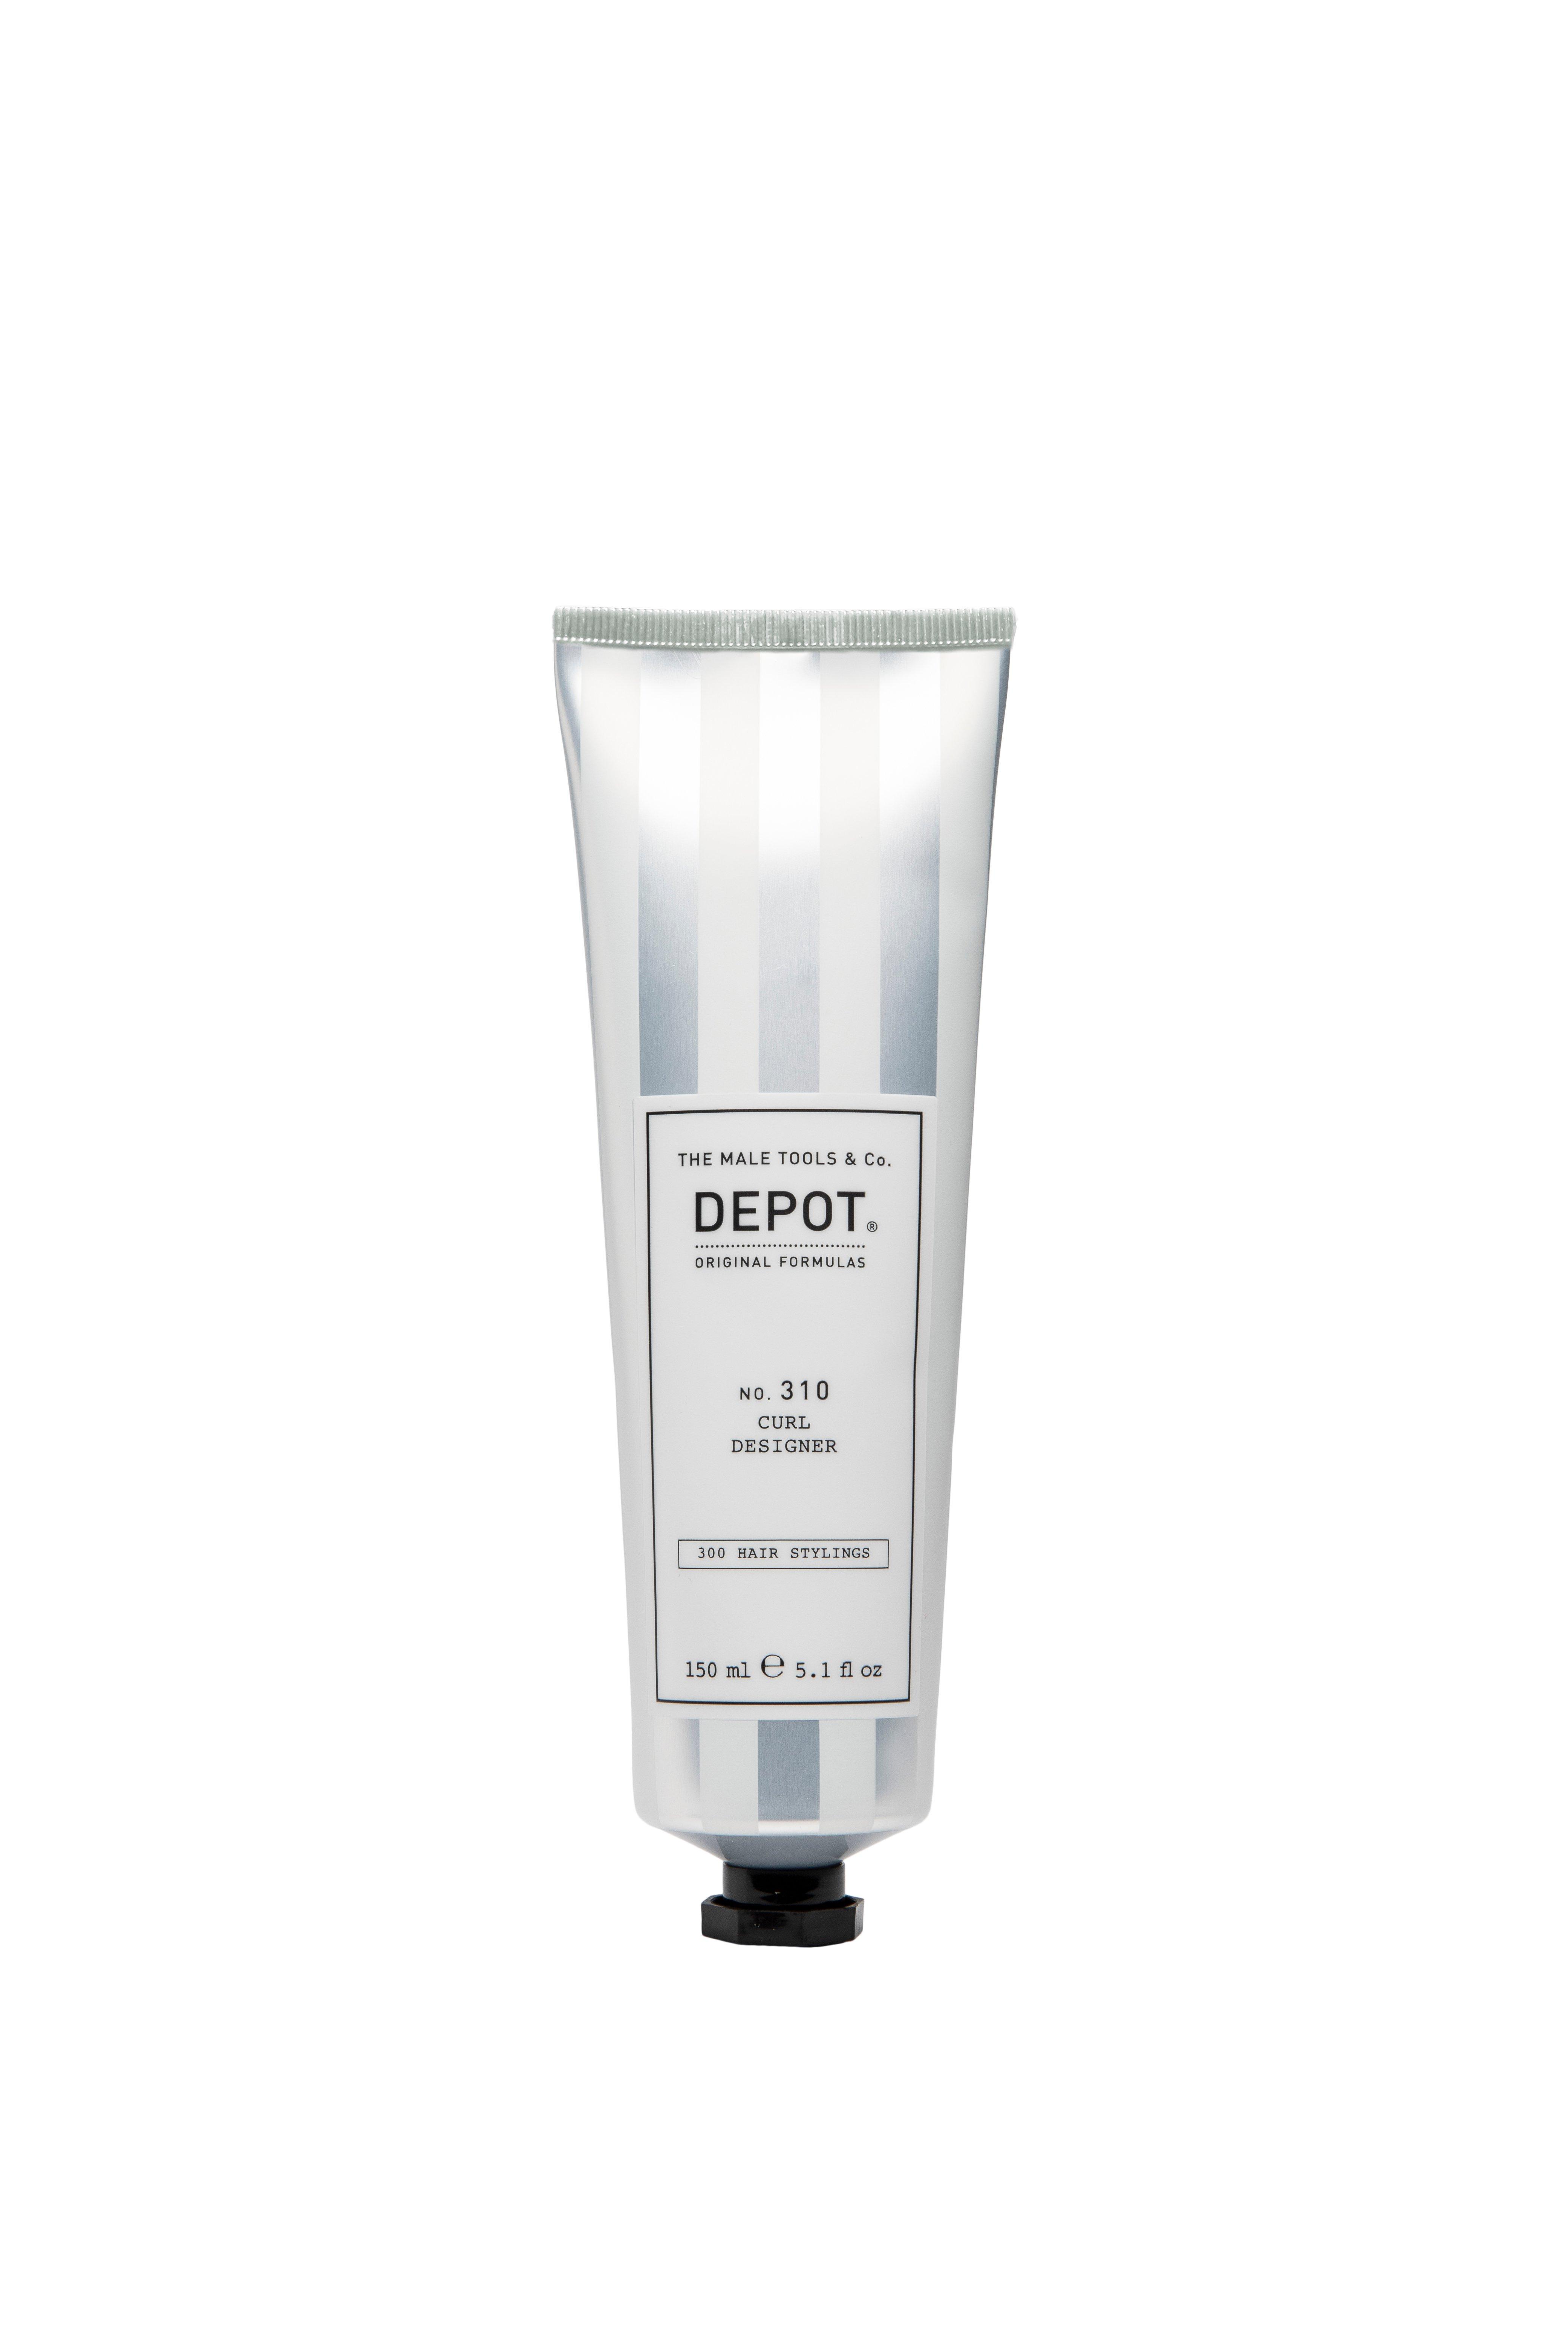 Depot - No. 310 Curl Designer 150 ml